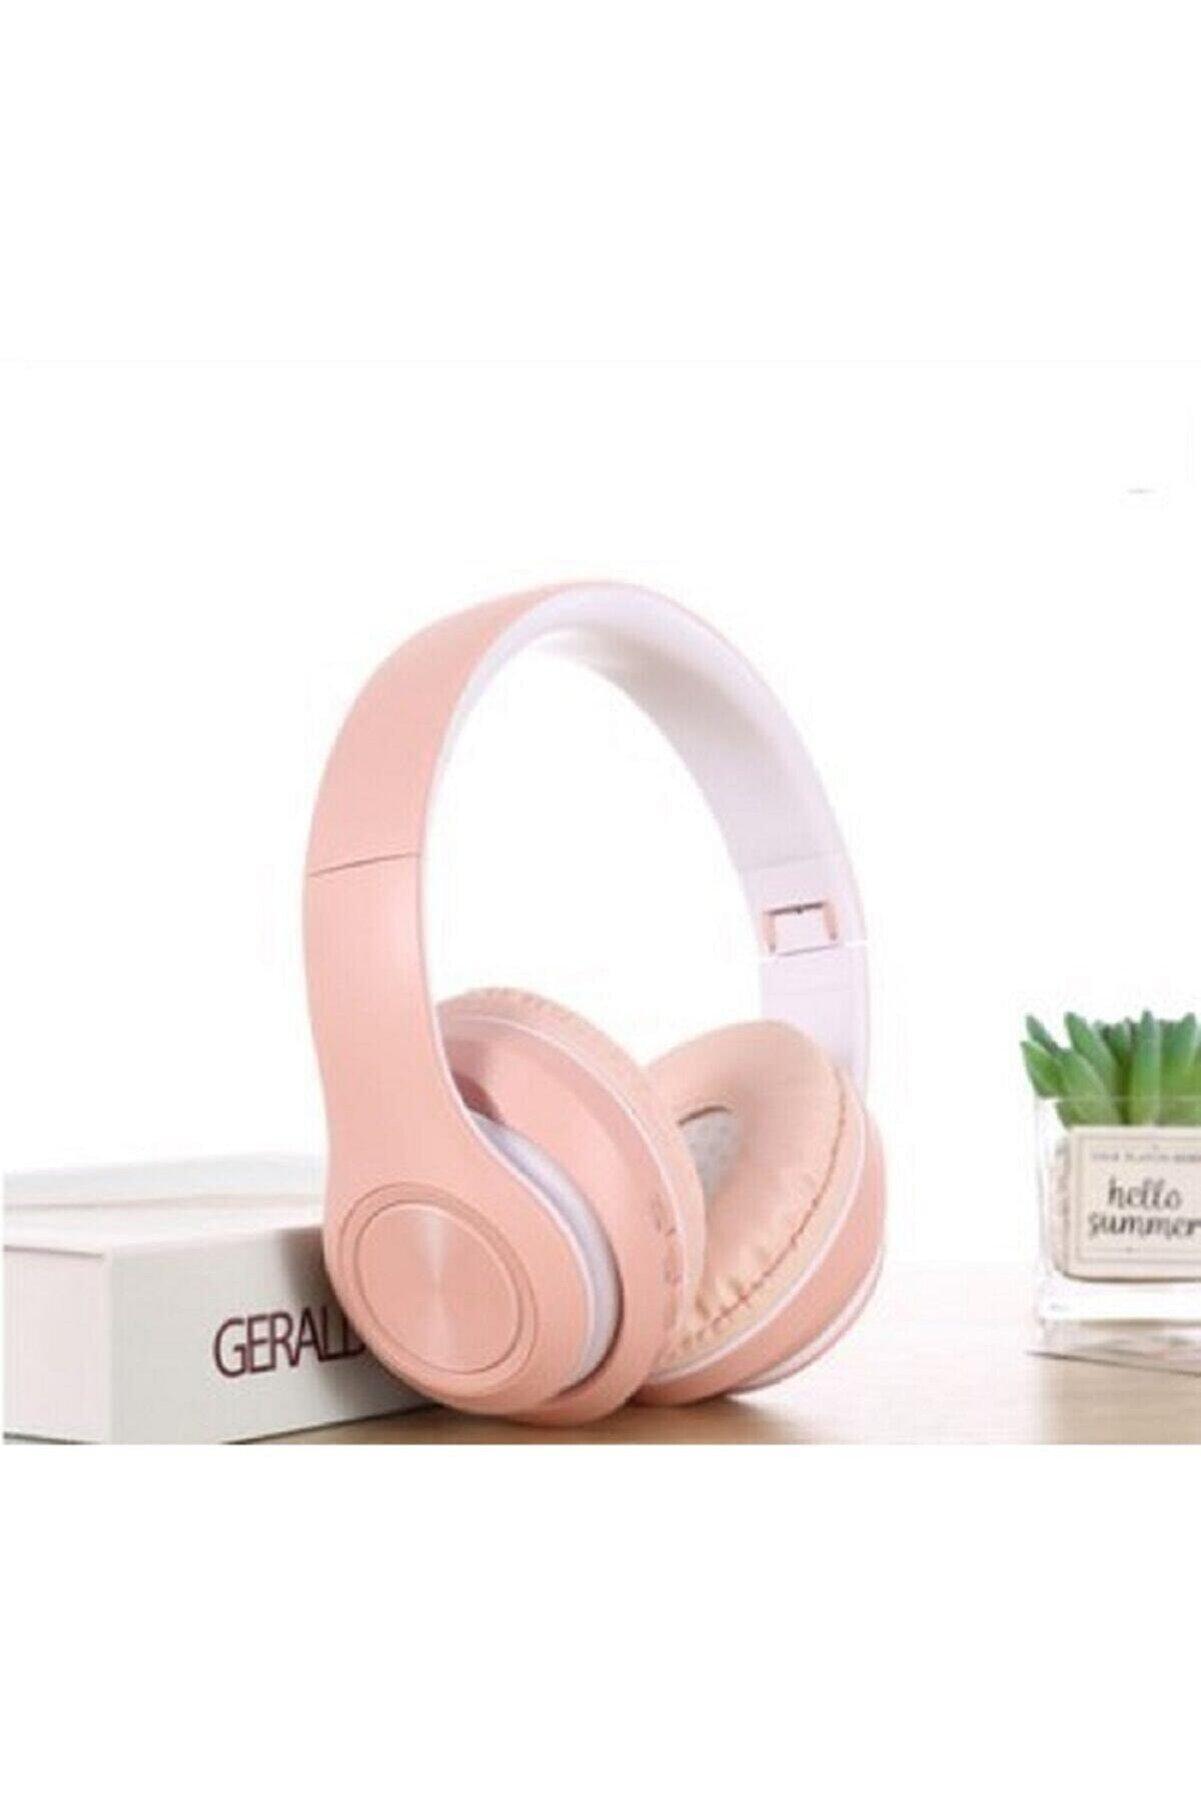 Hooptech Pembe Macaron Set Bluetooth Kablosuz Stereo Kulaklık